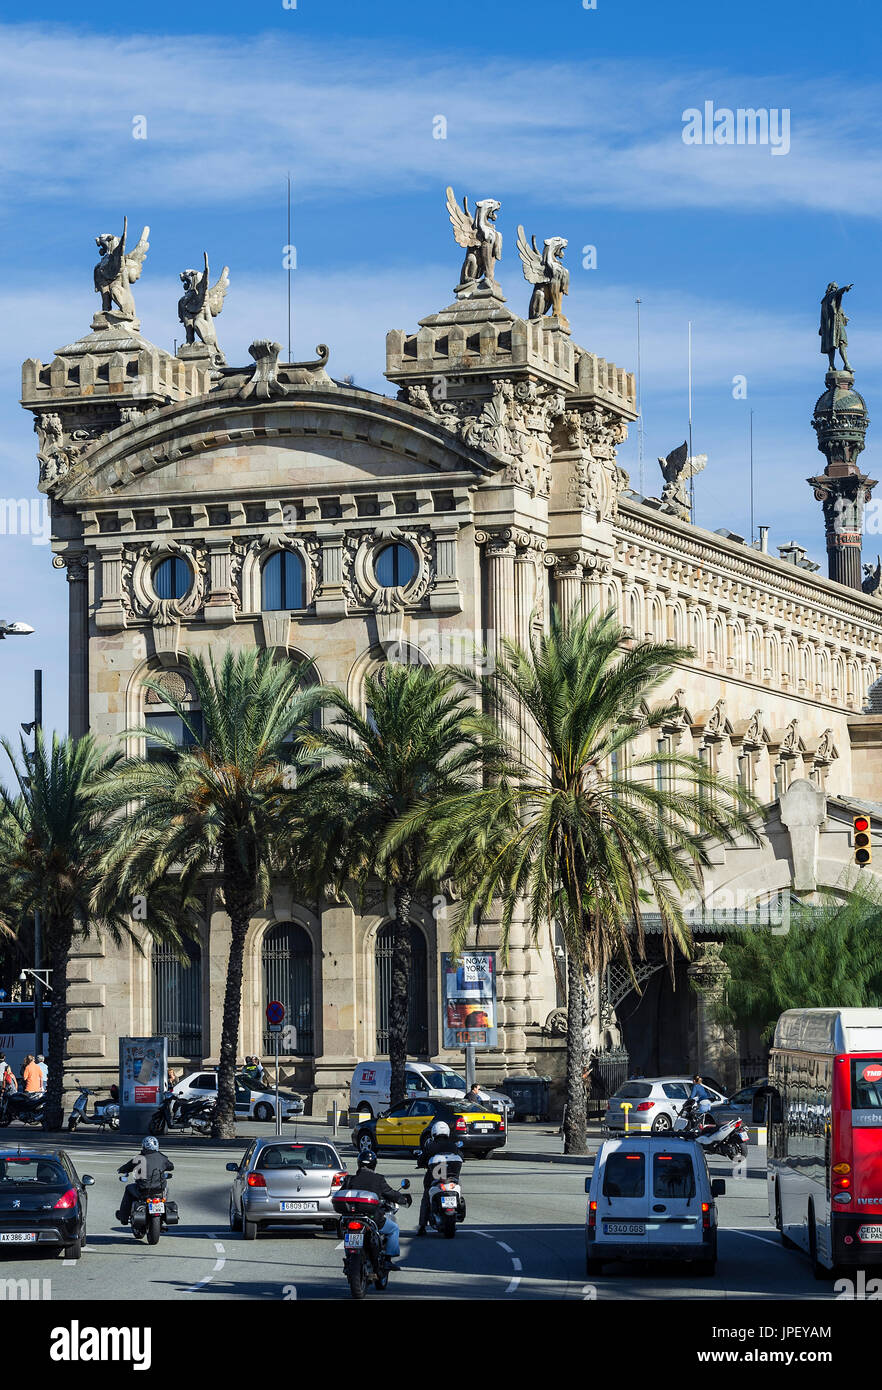 Ancien Custom House, Port Vell, Barcelone, Espagne. Photo Stock